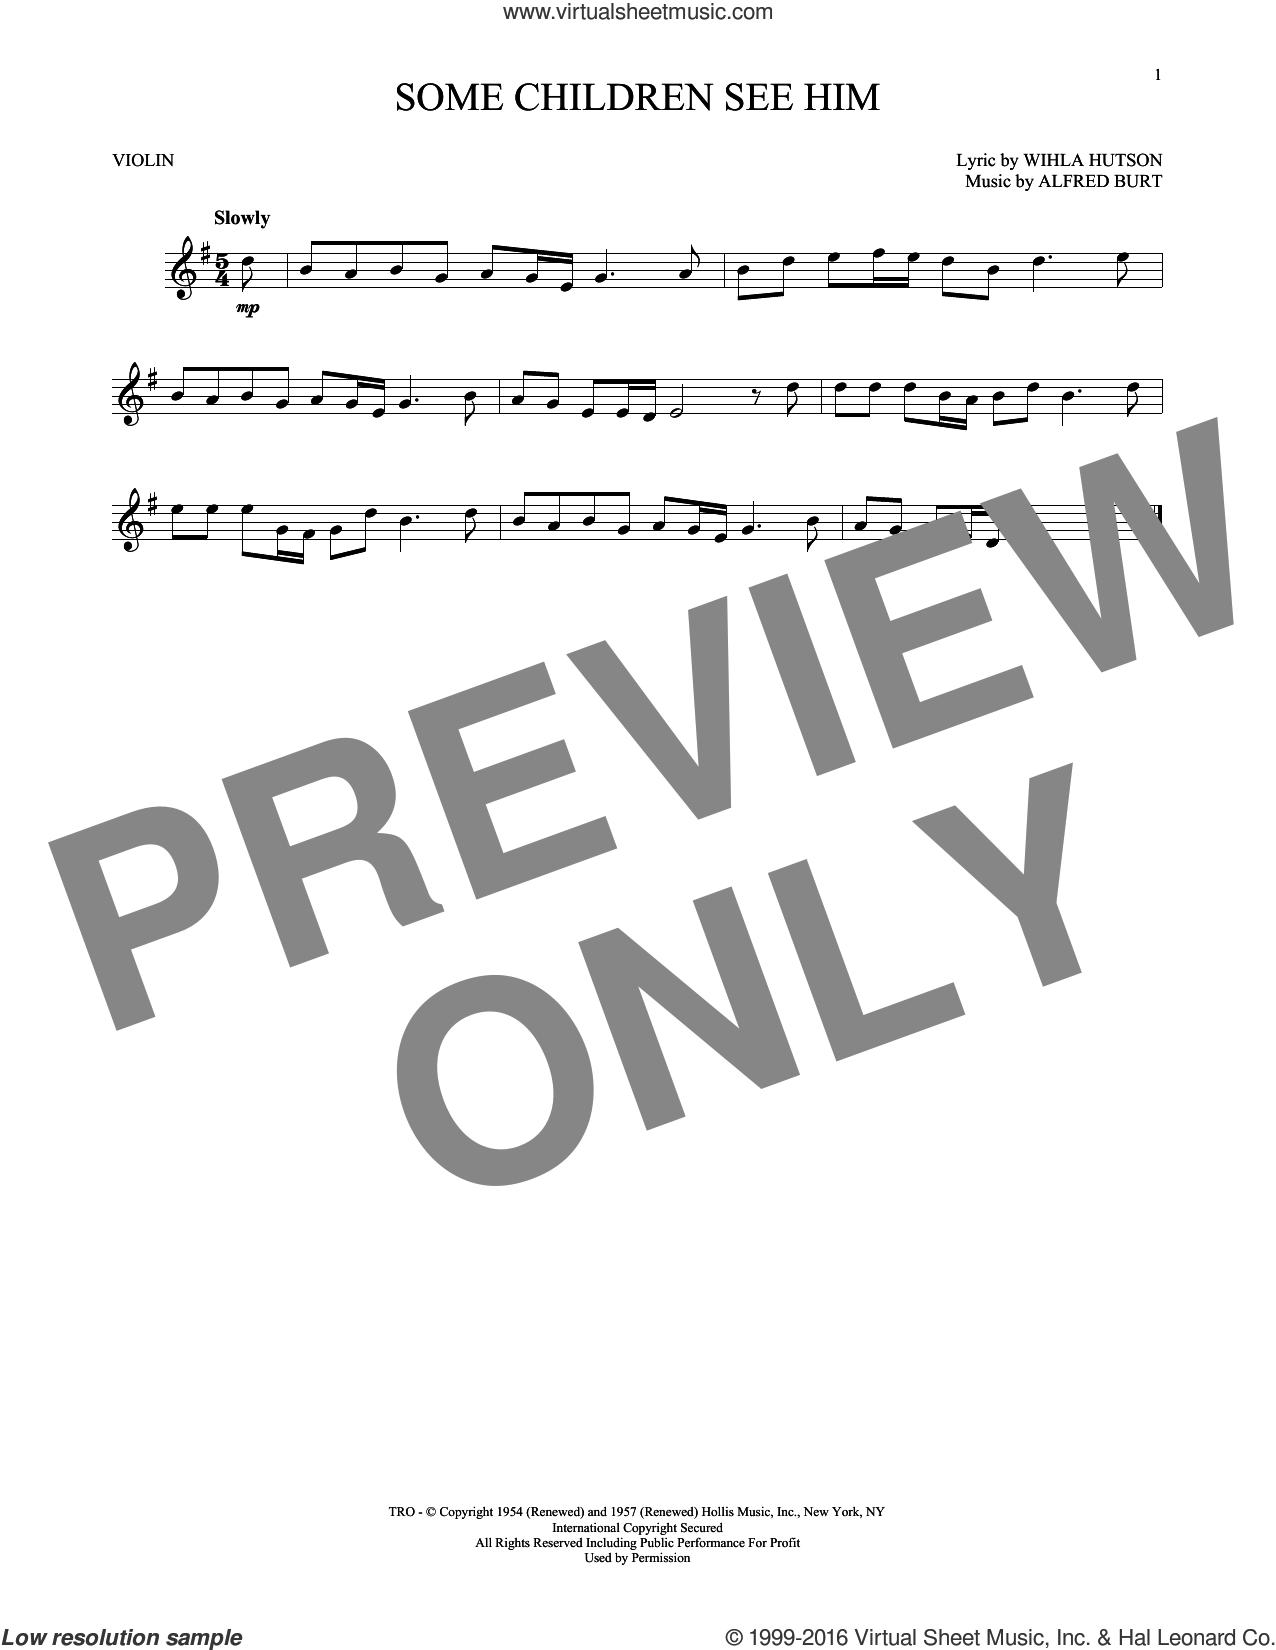 Some Children See Him sheet music for violin solo by Alfred Burt and Wihla Hutson, intermediate skill level